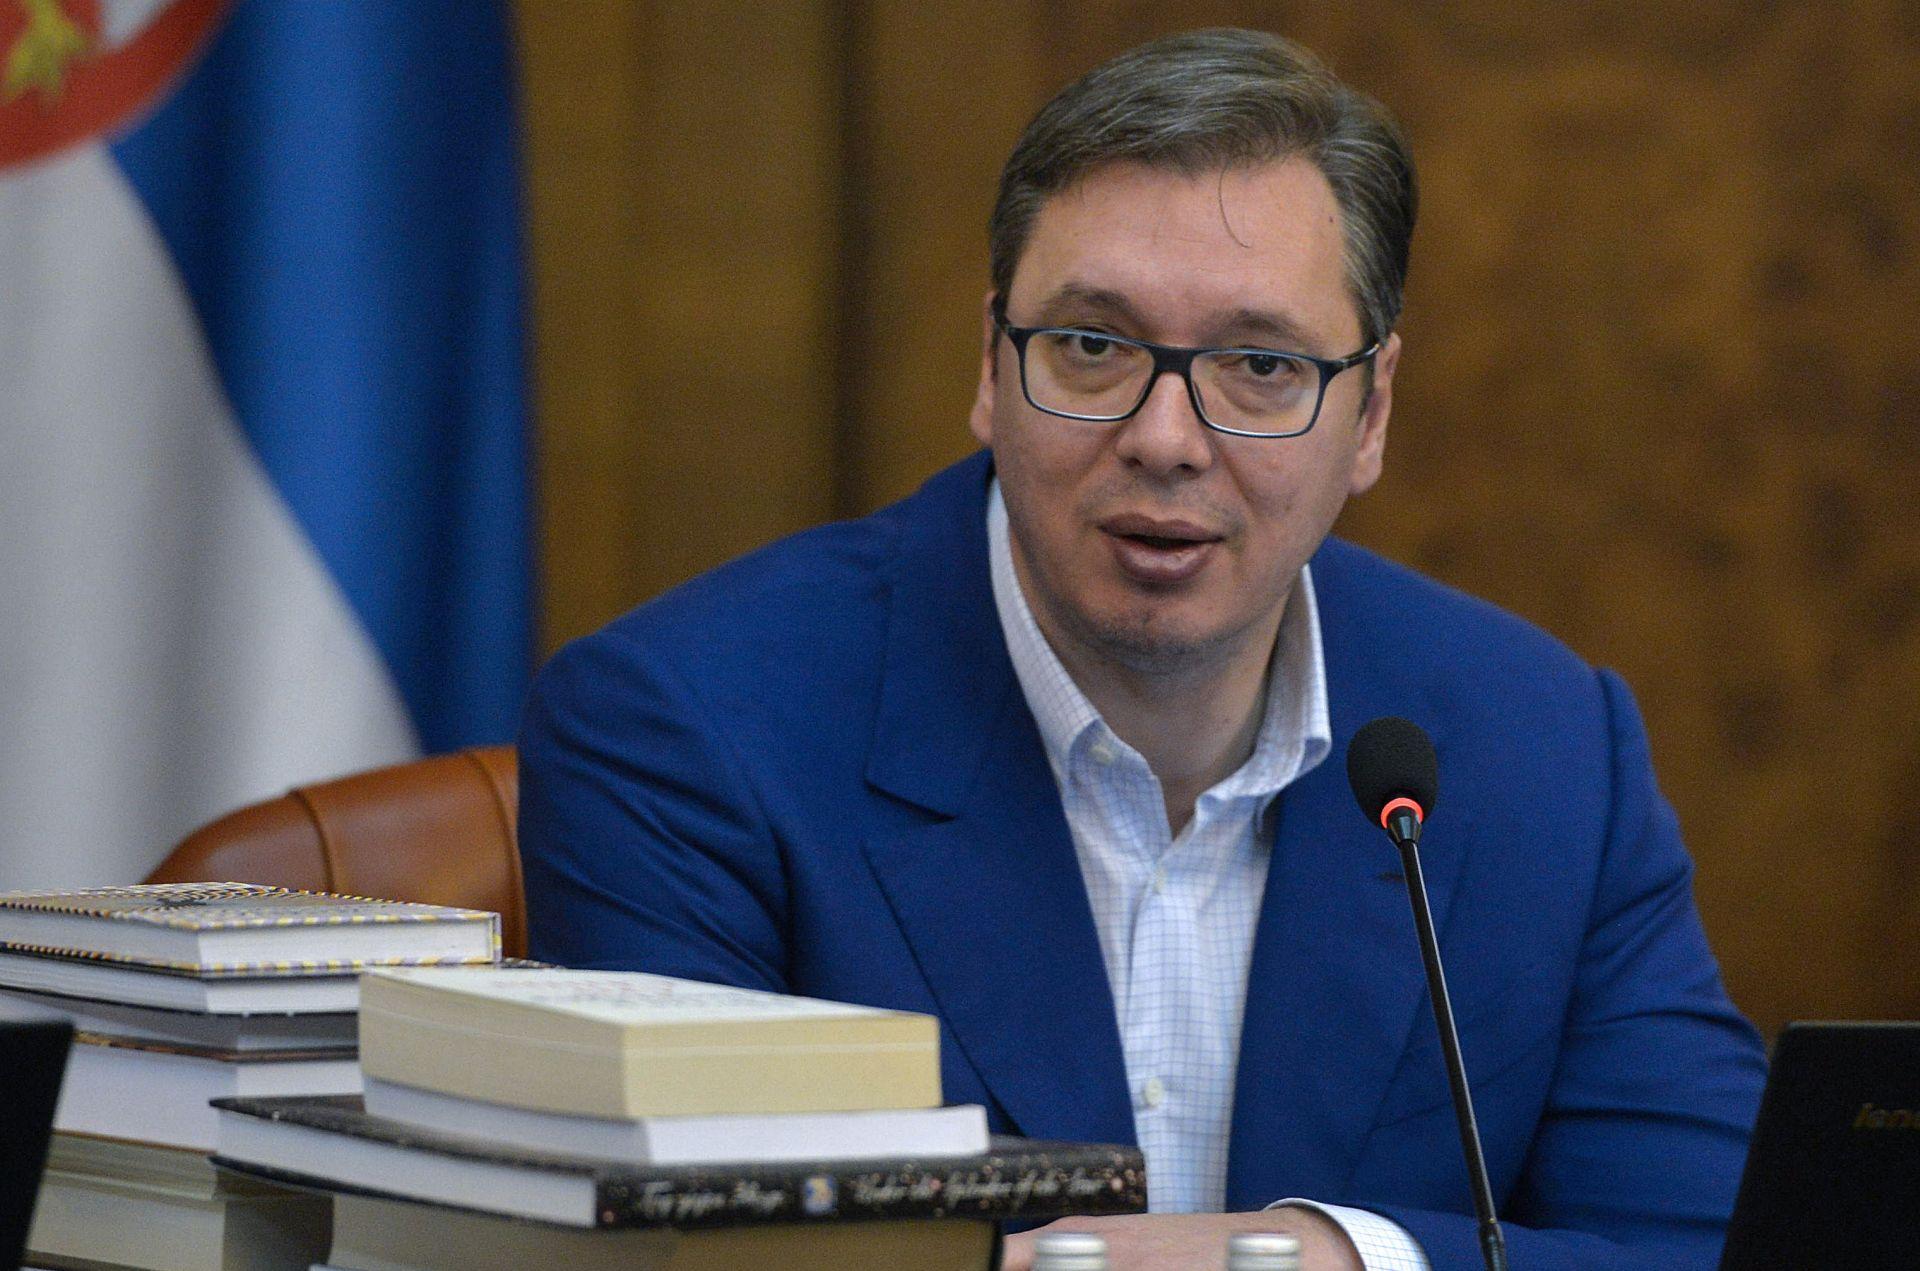 Srbija iskoristila milijardu eura iz IPA fondova EU